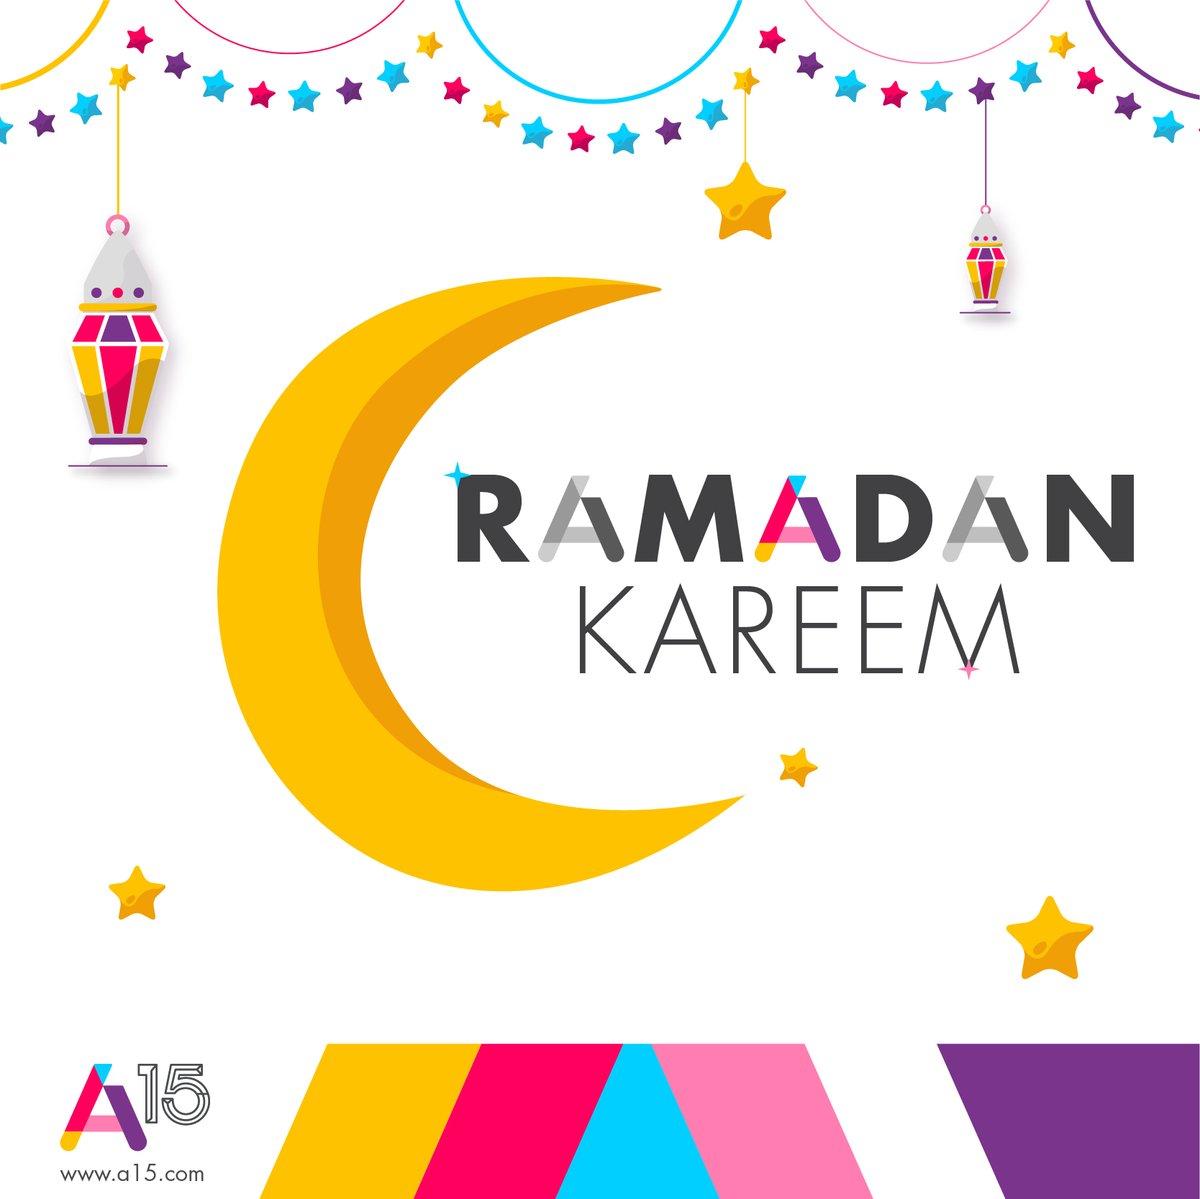 #A15_Family is wishing you a blessed #Ramadan !! https://t.co/jJCanTtk8L